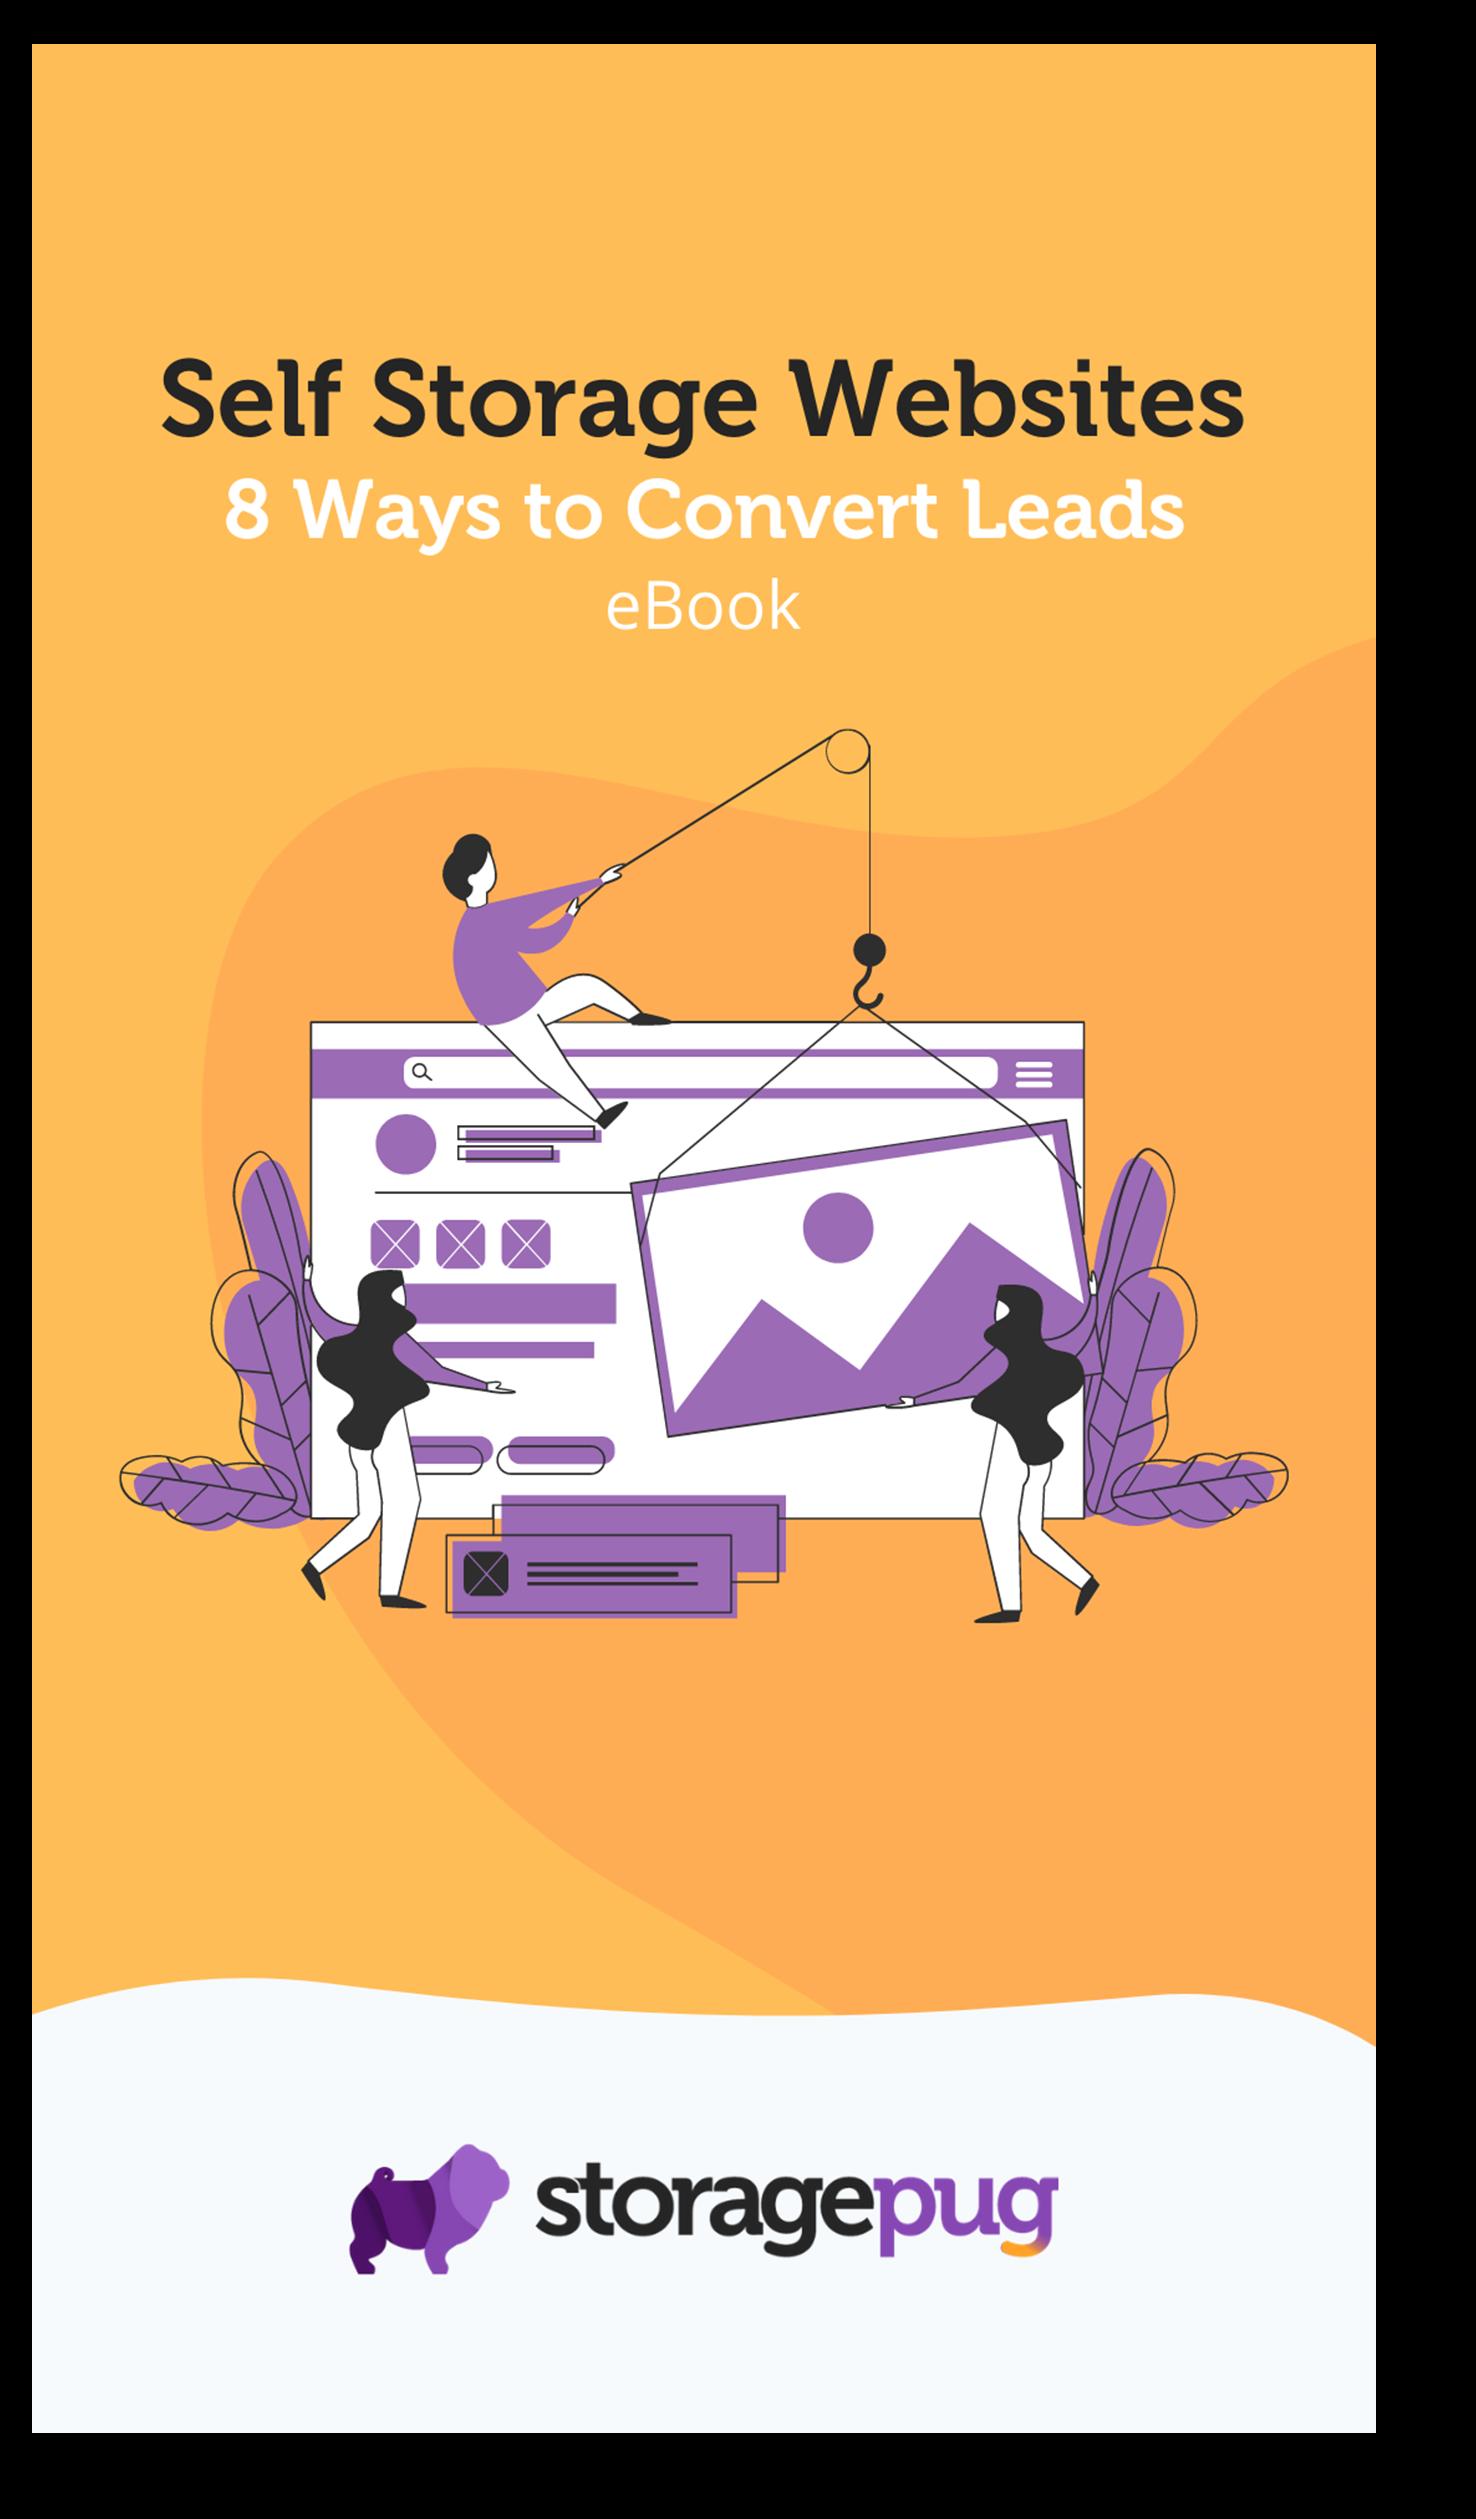 Self Storage Websites - 8 Ways eBook - Cover